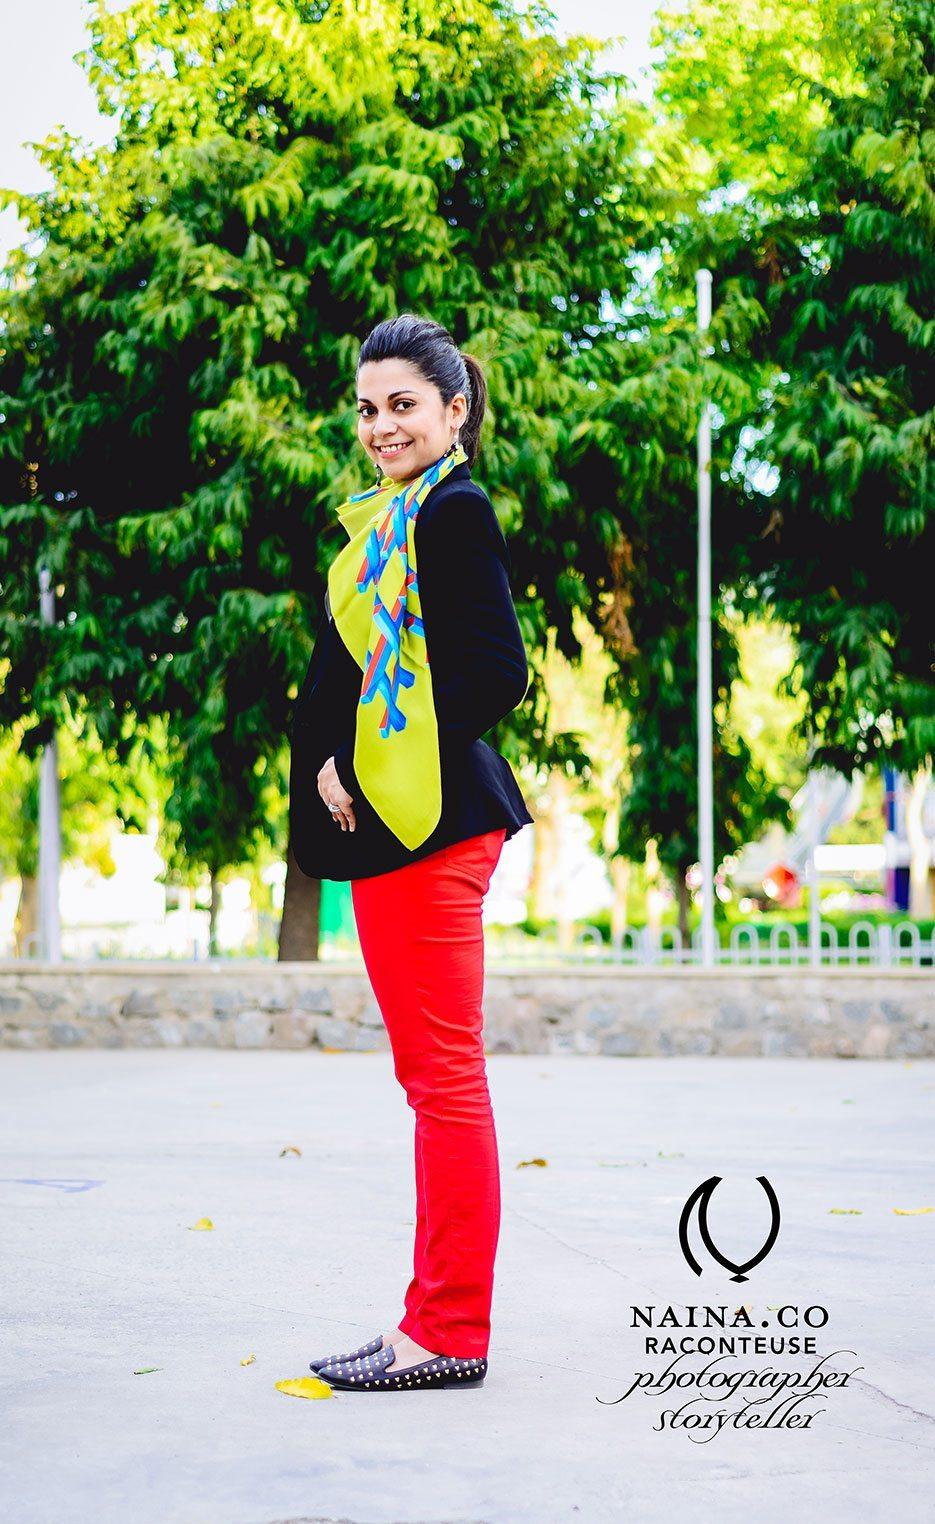 Fiama-Naina-Akanksha-WIFWAW14-CoverUp-14-Raconteuse-Storyteller-Photographer-Naina.co